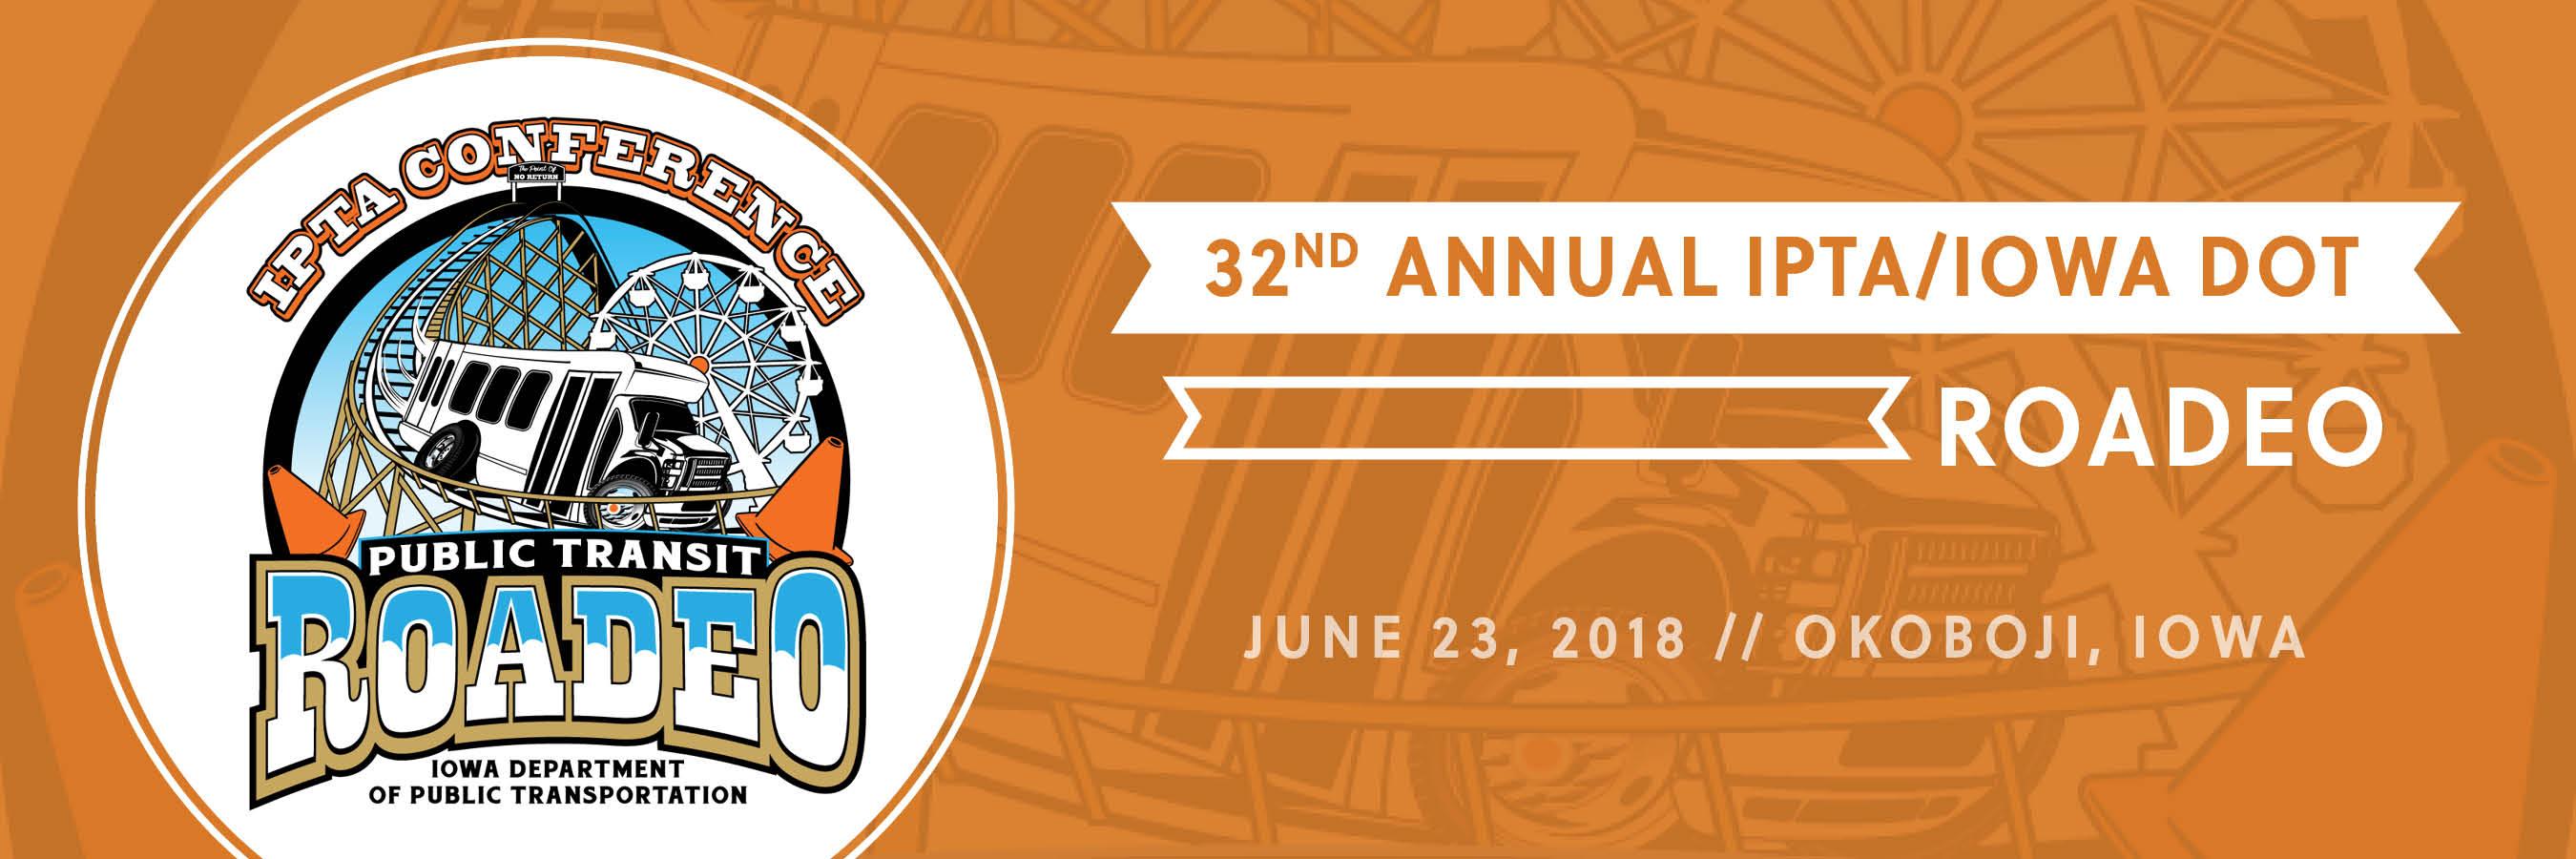 2018 Driver Award Ceremony Dinner & ROADEO